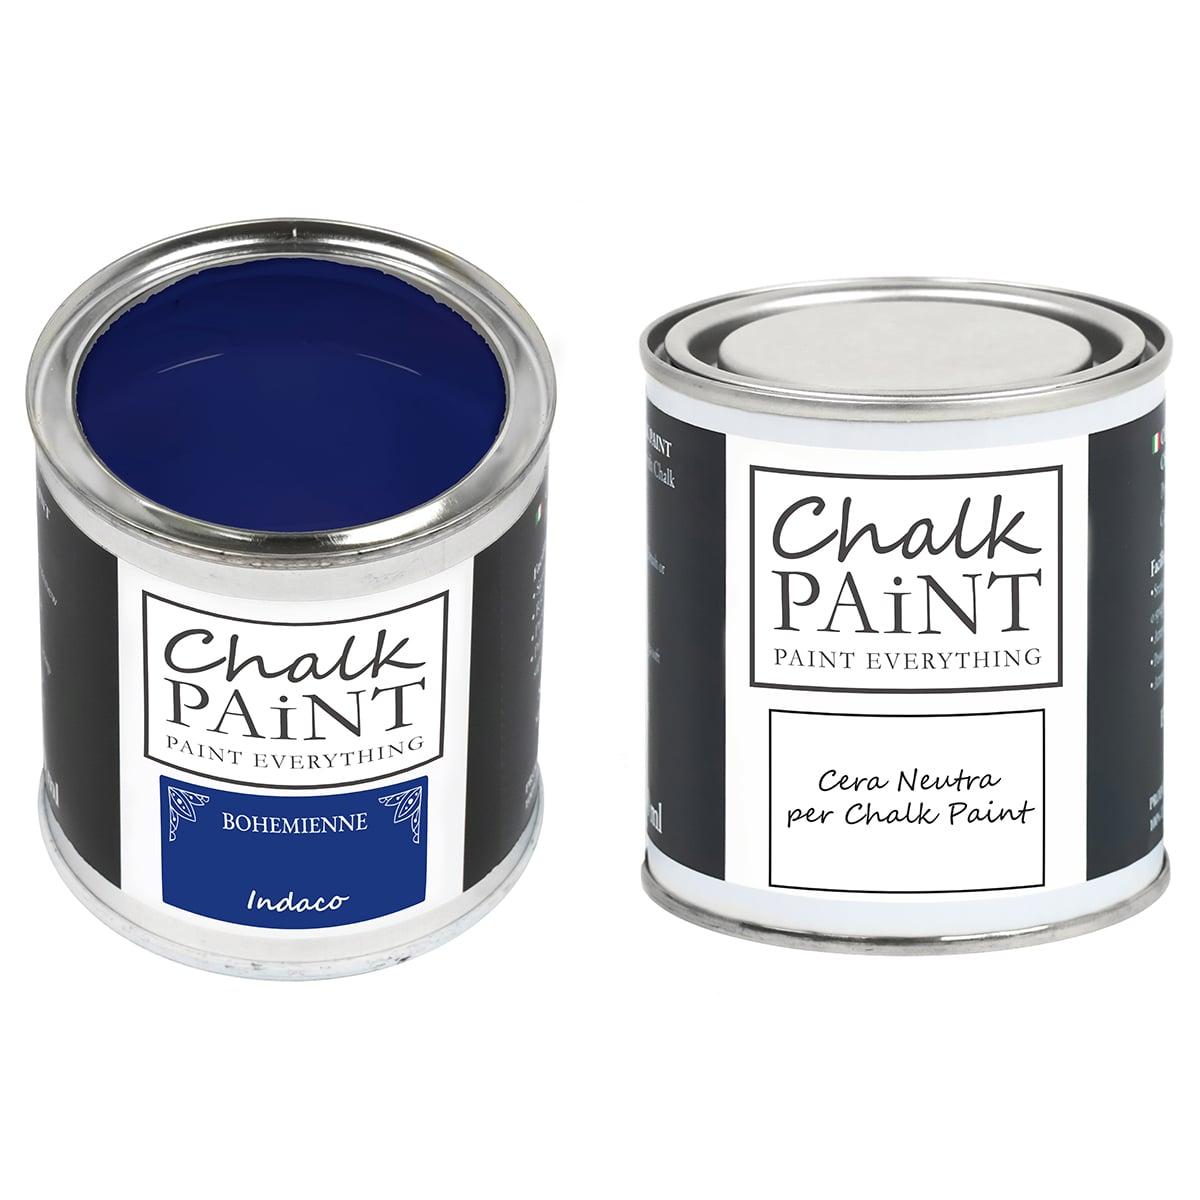 Indaco Chalk paint e cera in offerta decora facile con paint magic